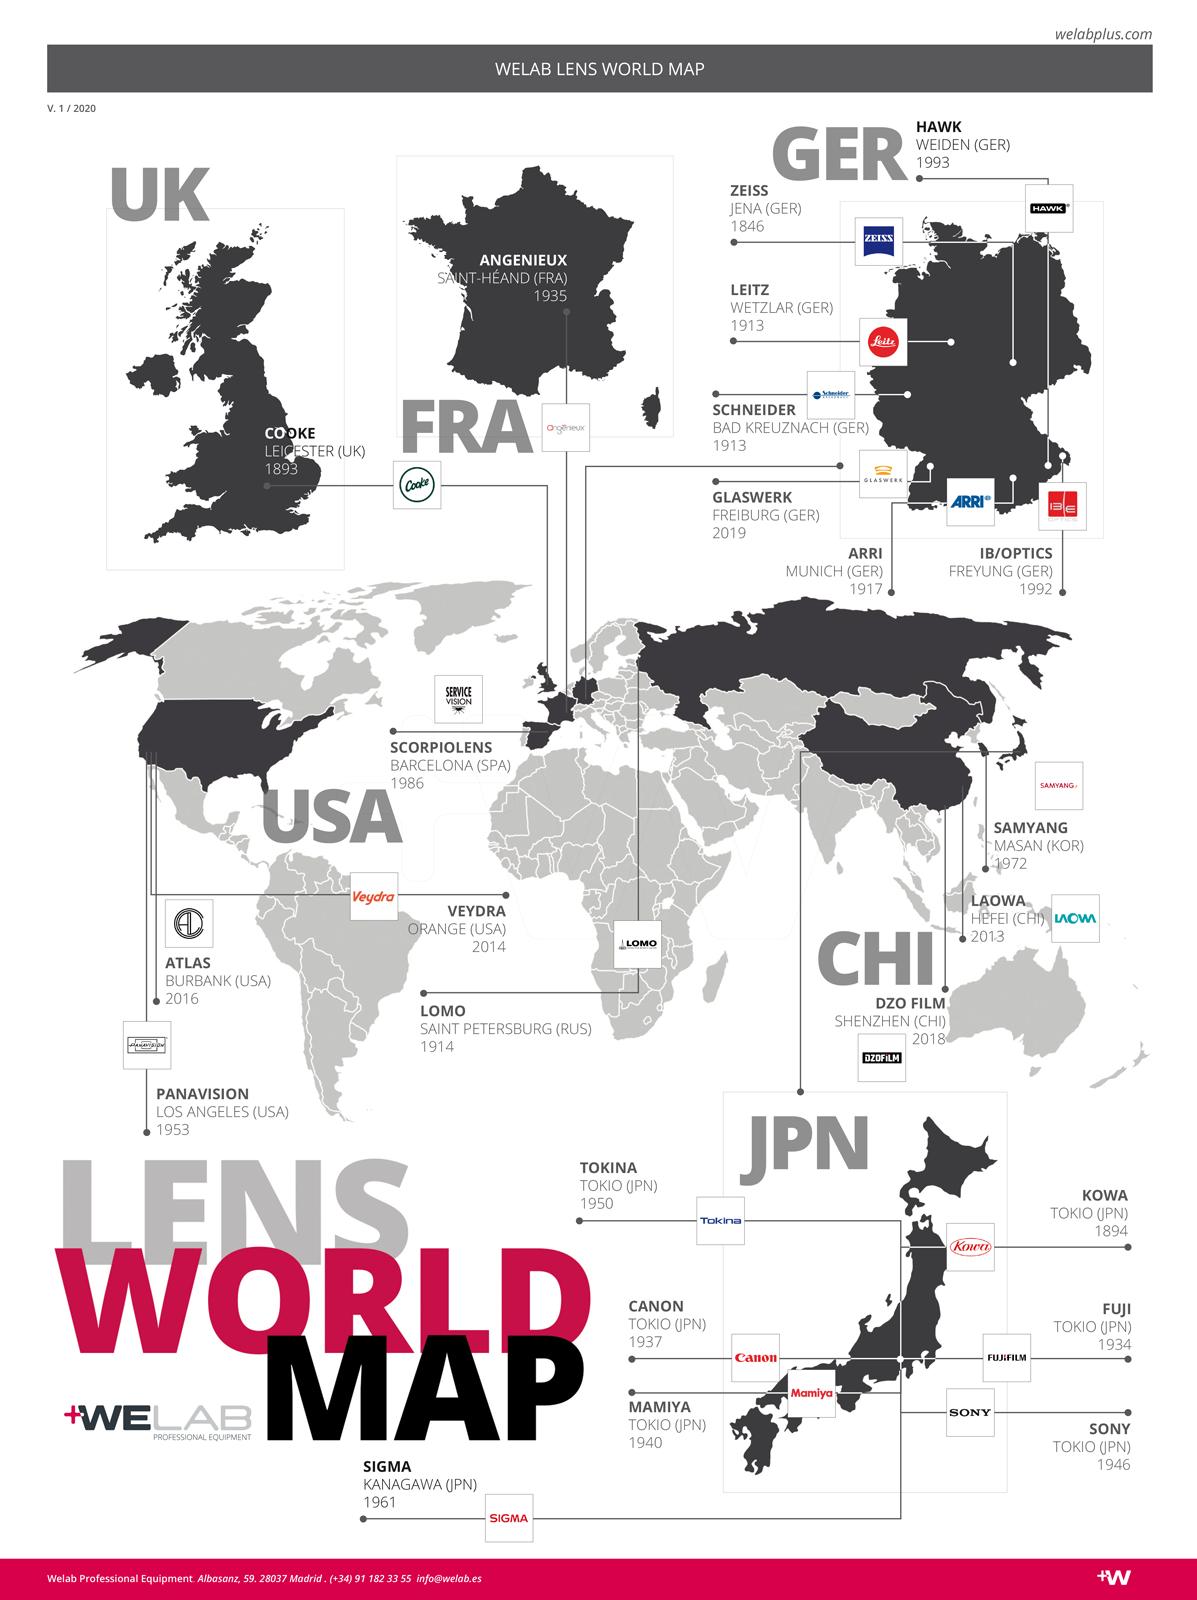 COMPARATIVA LENS WORLD MAP WELAB PLUS